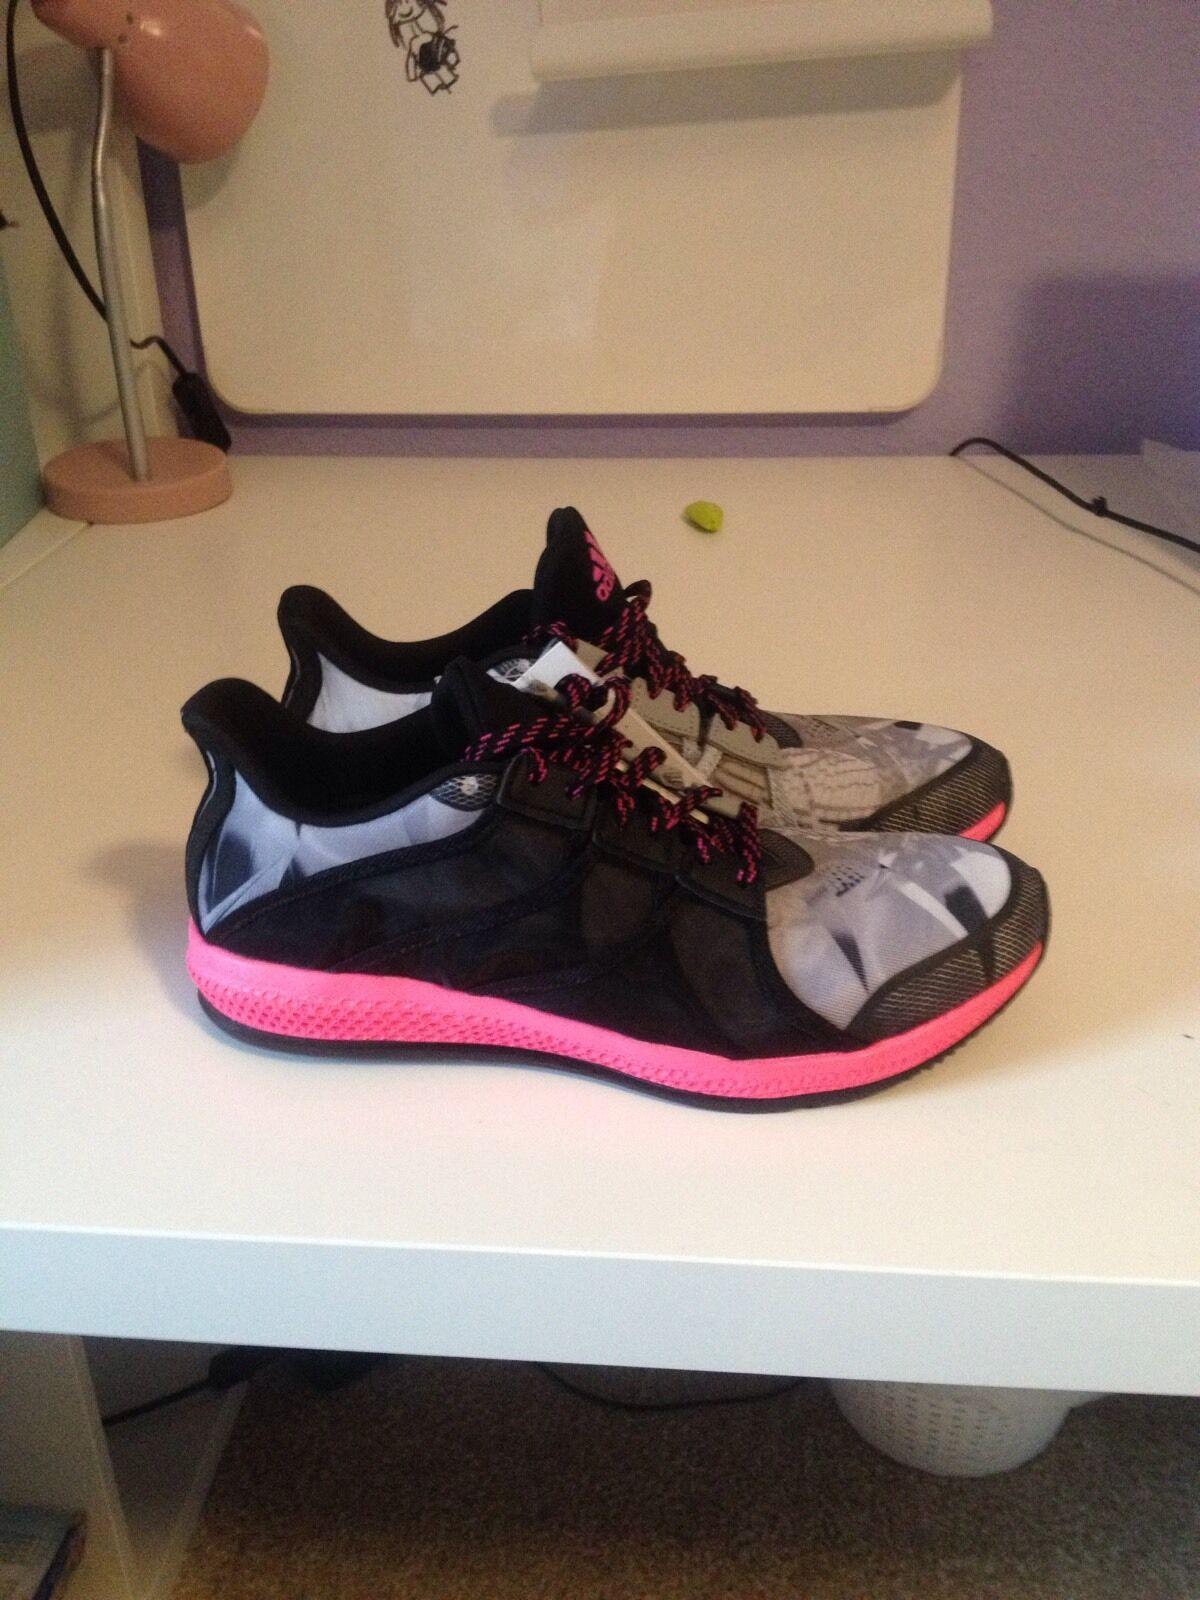 Adidas Gymbreaker Bounce Damen Trainingschuhe Gr:38 (BB3981 Neu ohne Karton